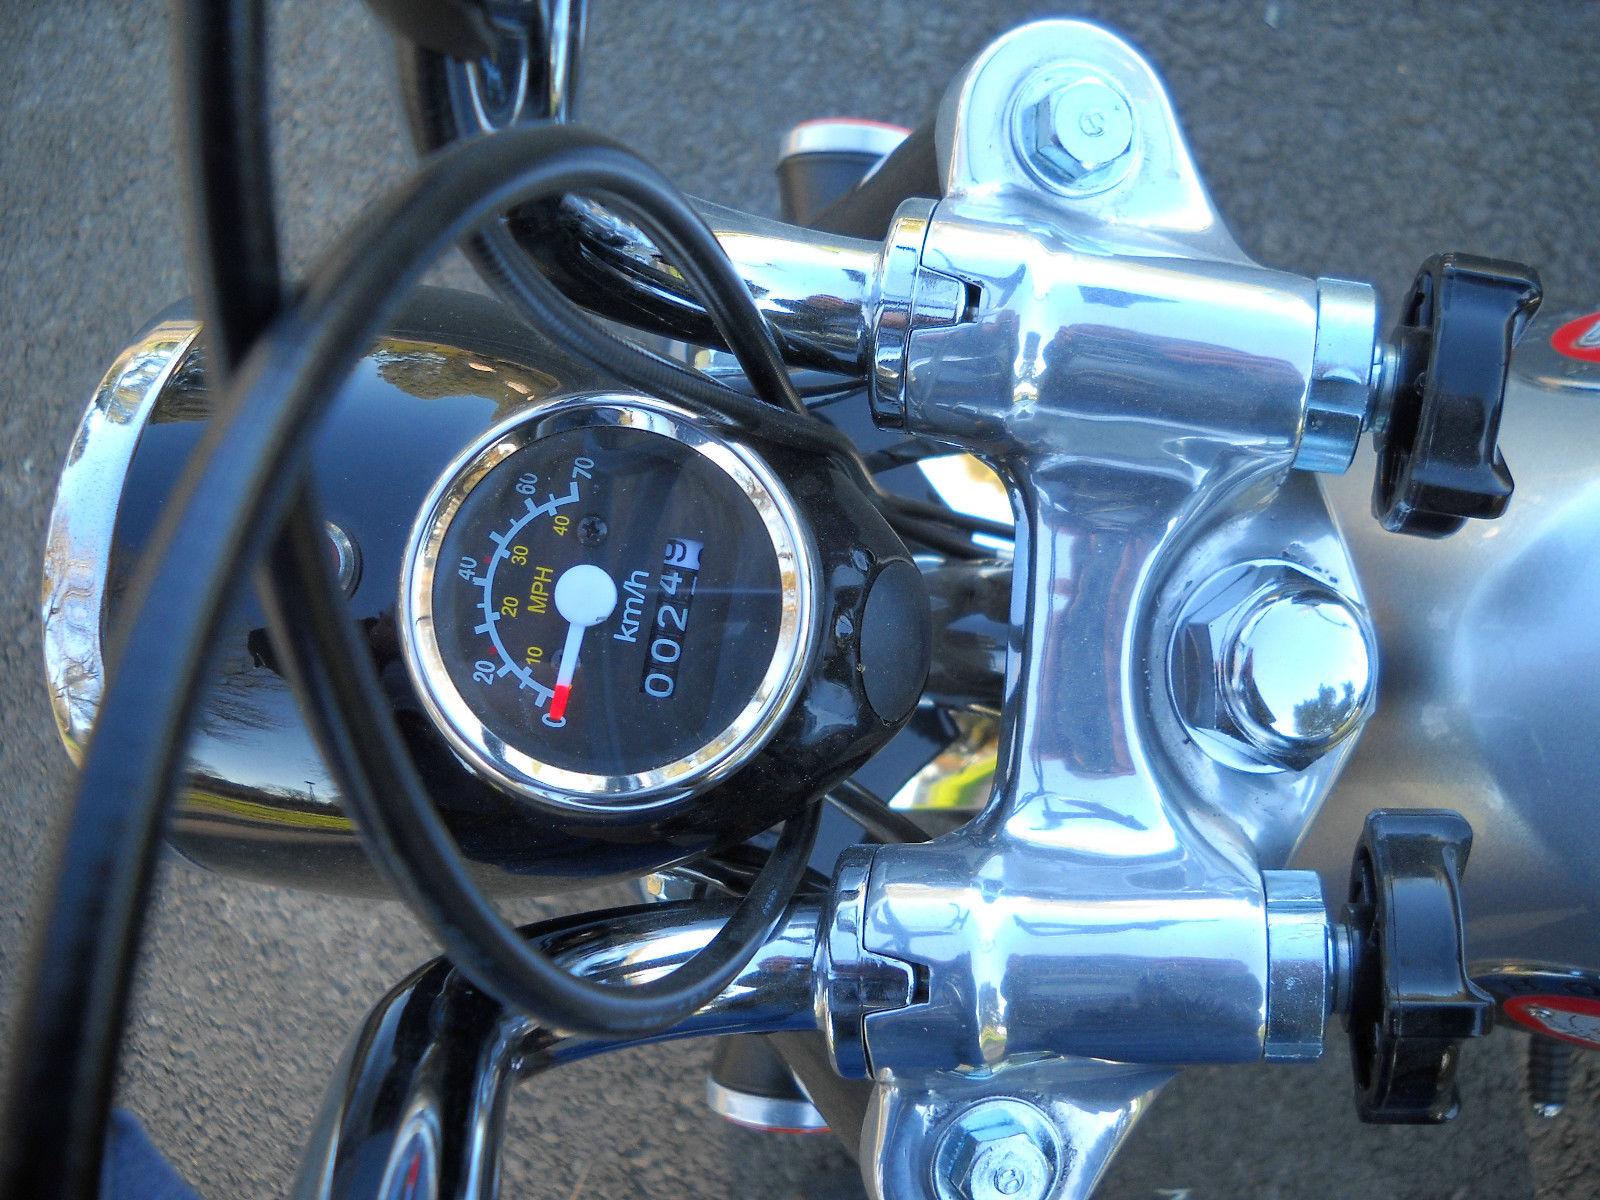 1970 Honda Z50 Minitrail Custom 4 Speed Manual Clutch Street Legal Ct70 Ignition Points Other